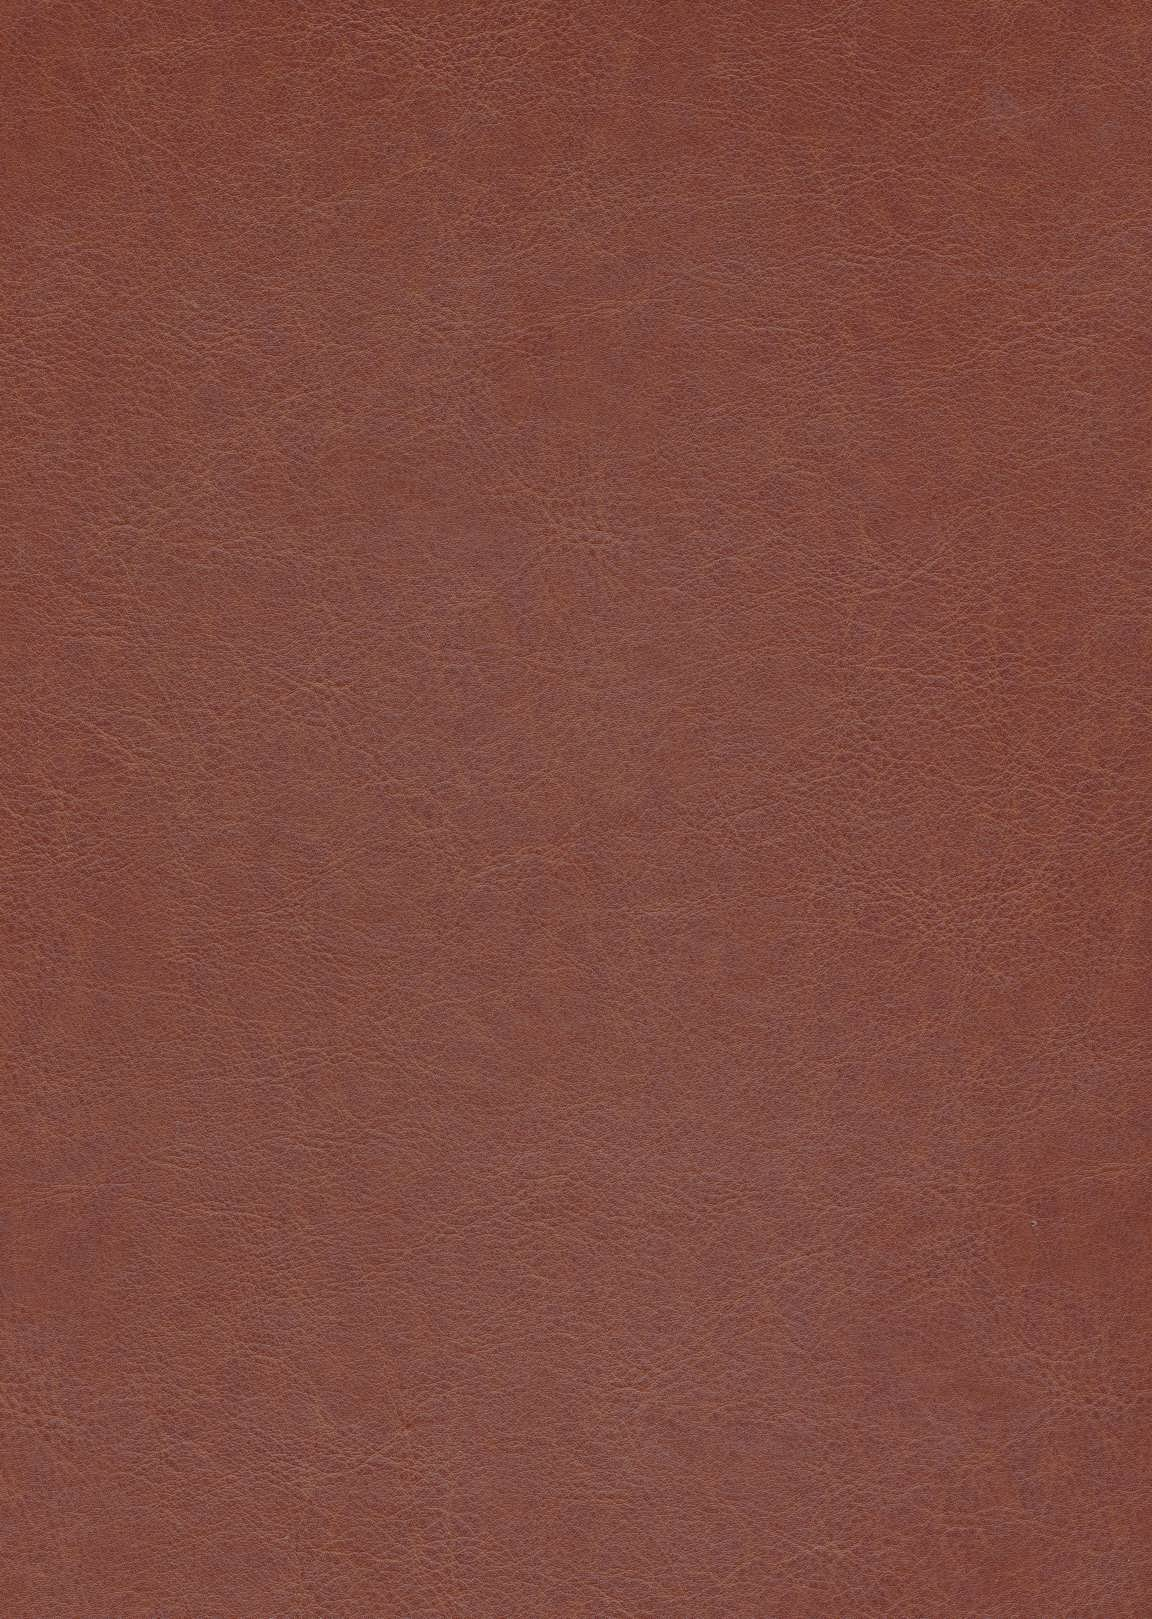 دیوان حافظ (معطر،گلاسه،باجعبه،چرم،لب طلایی،لیزری)